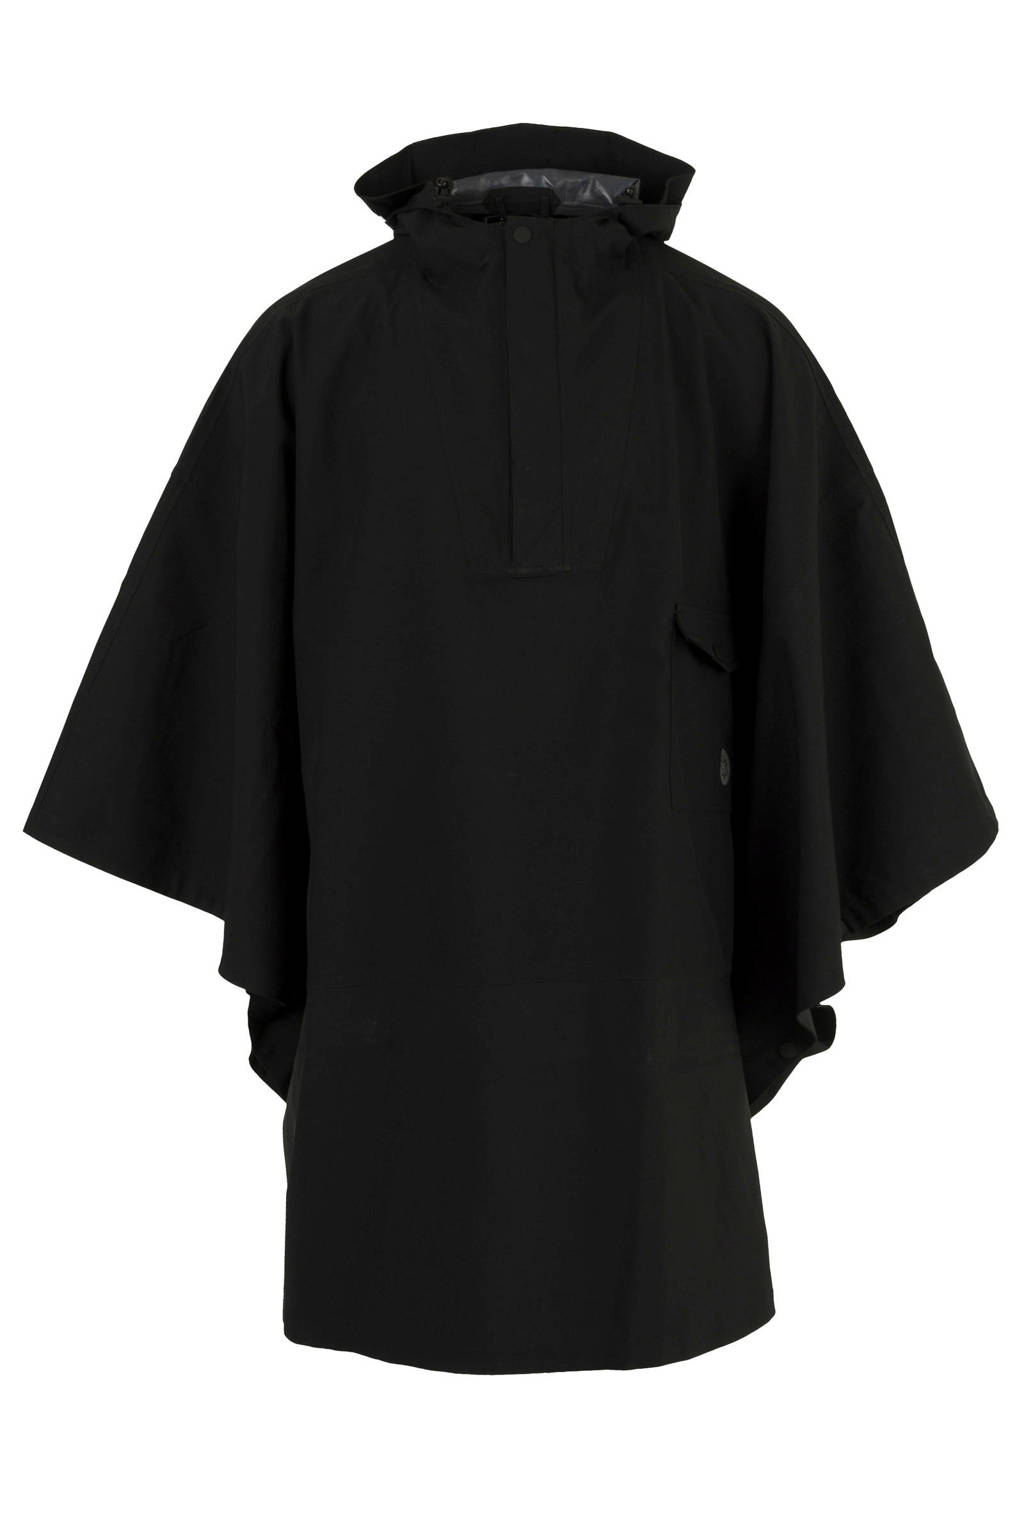 AGU regenponcho zwart, Zwart